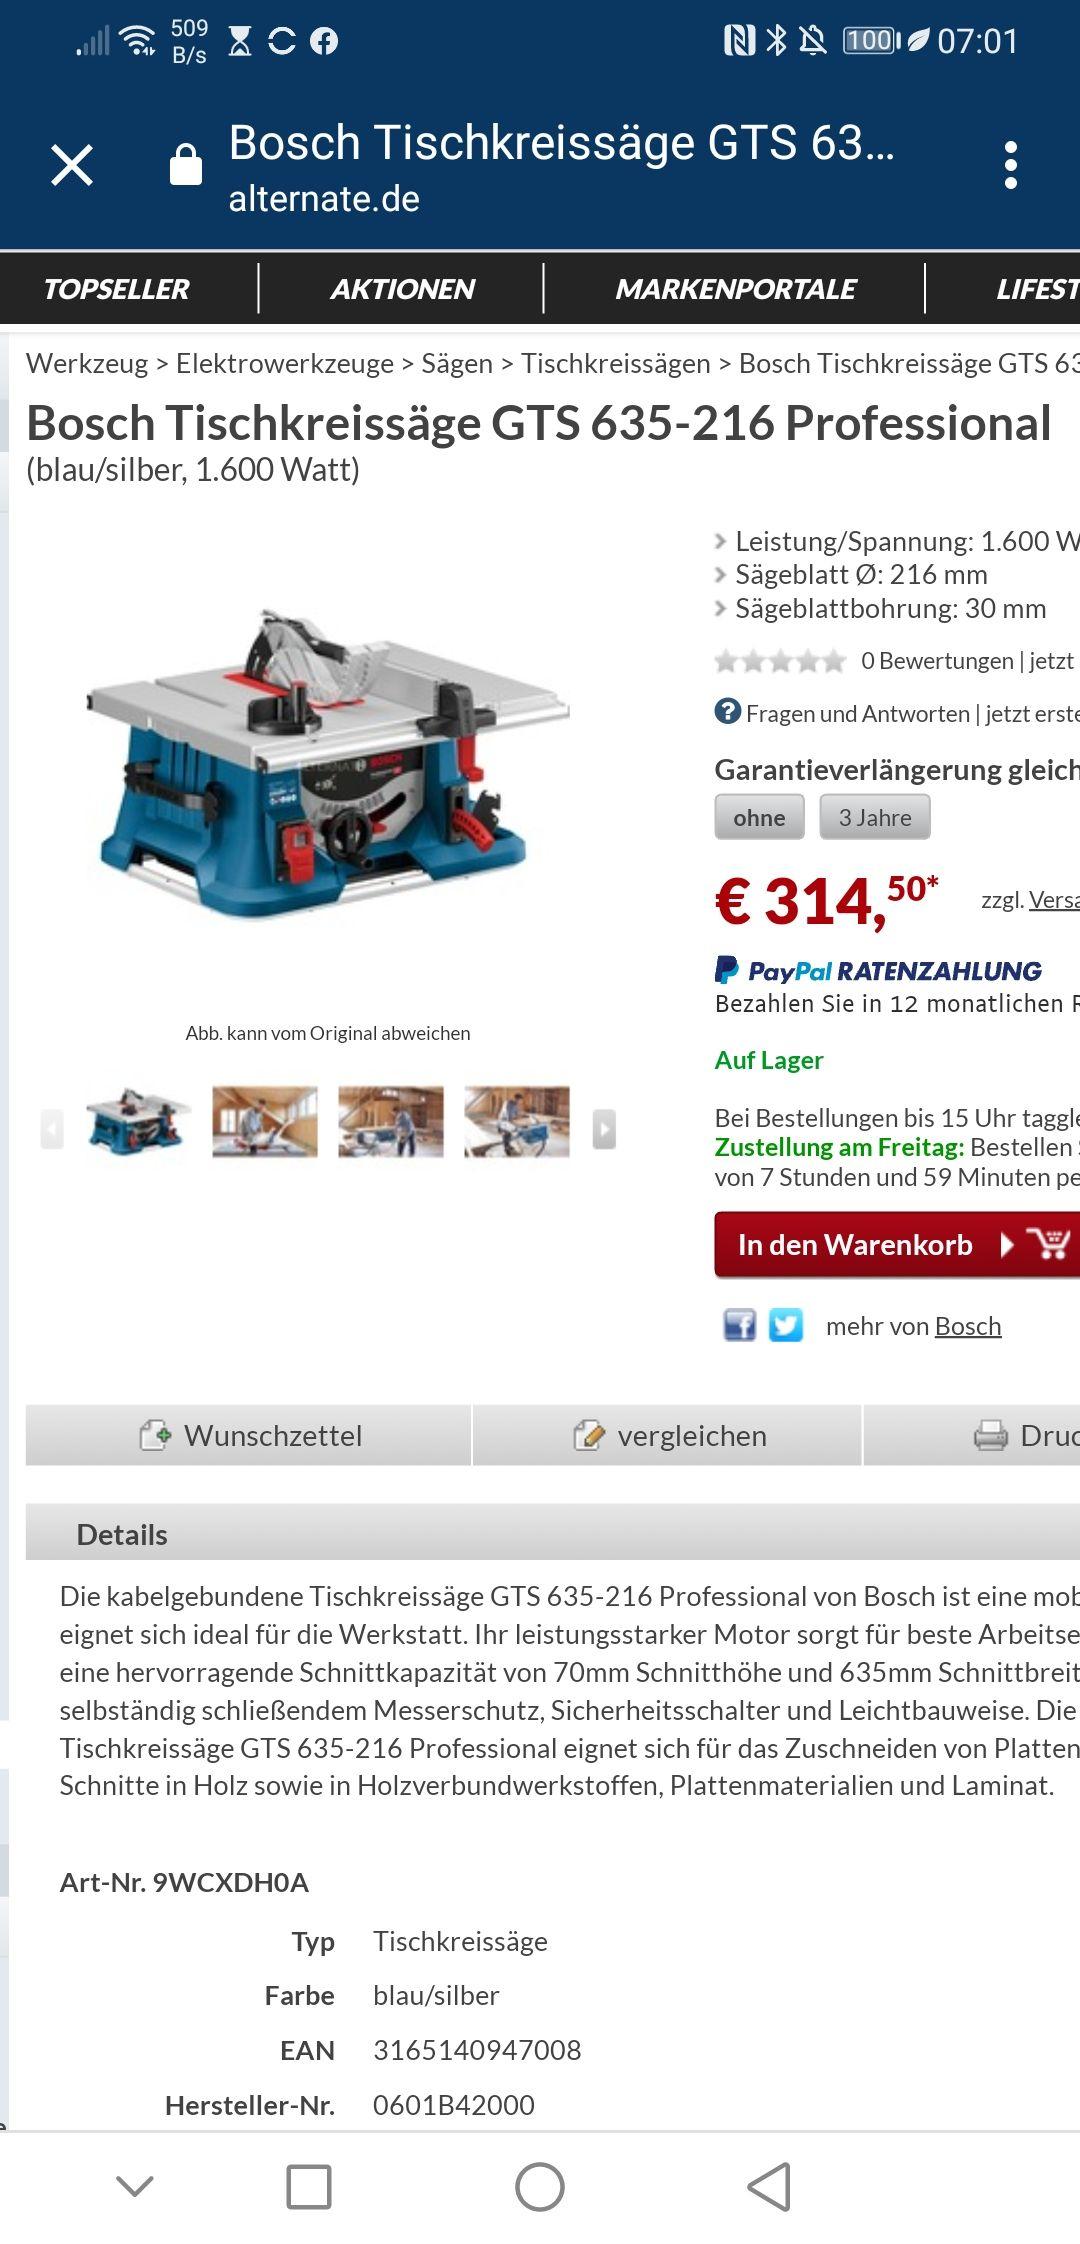 Bosch GTS 635-216 mit Bestpreis (lokal bei Hornbach)